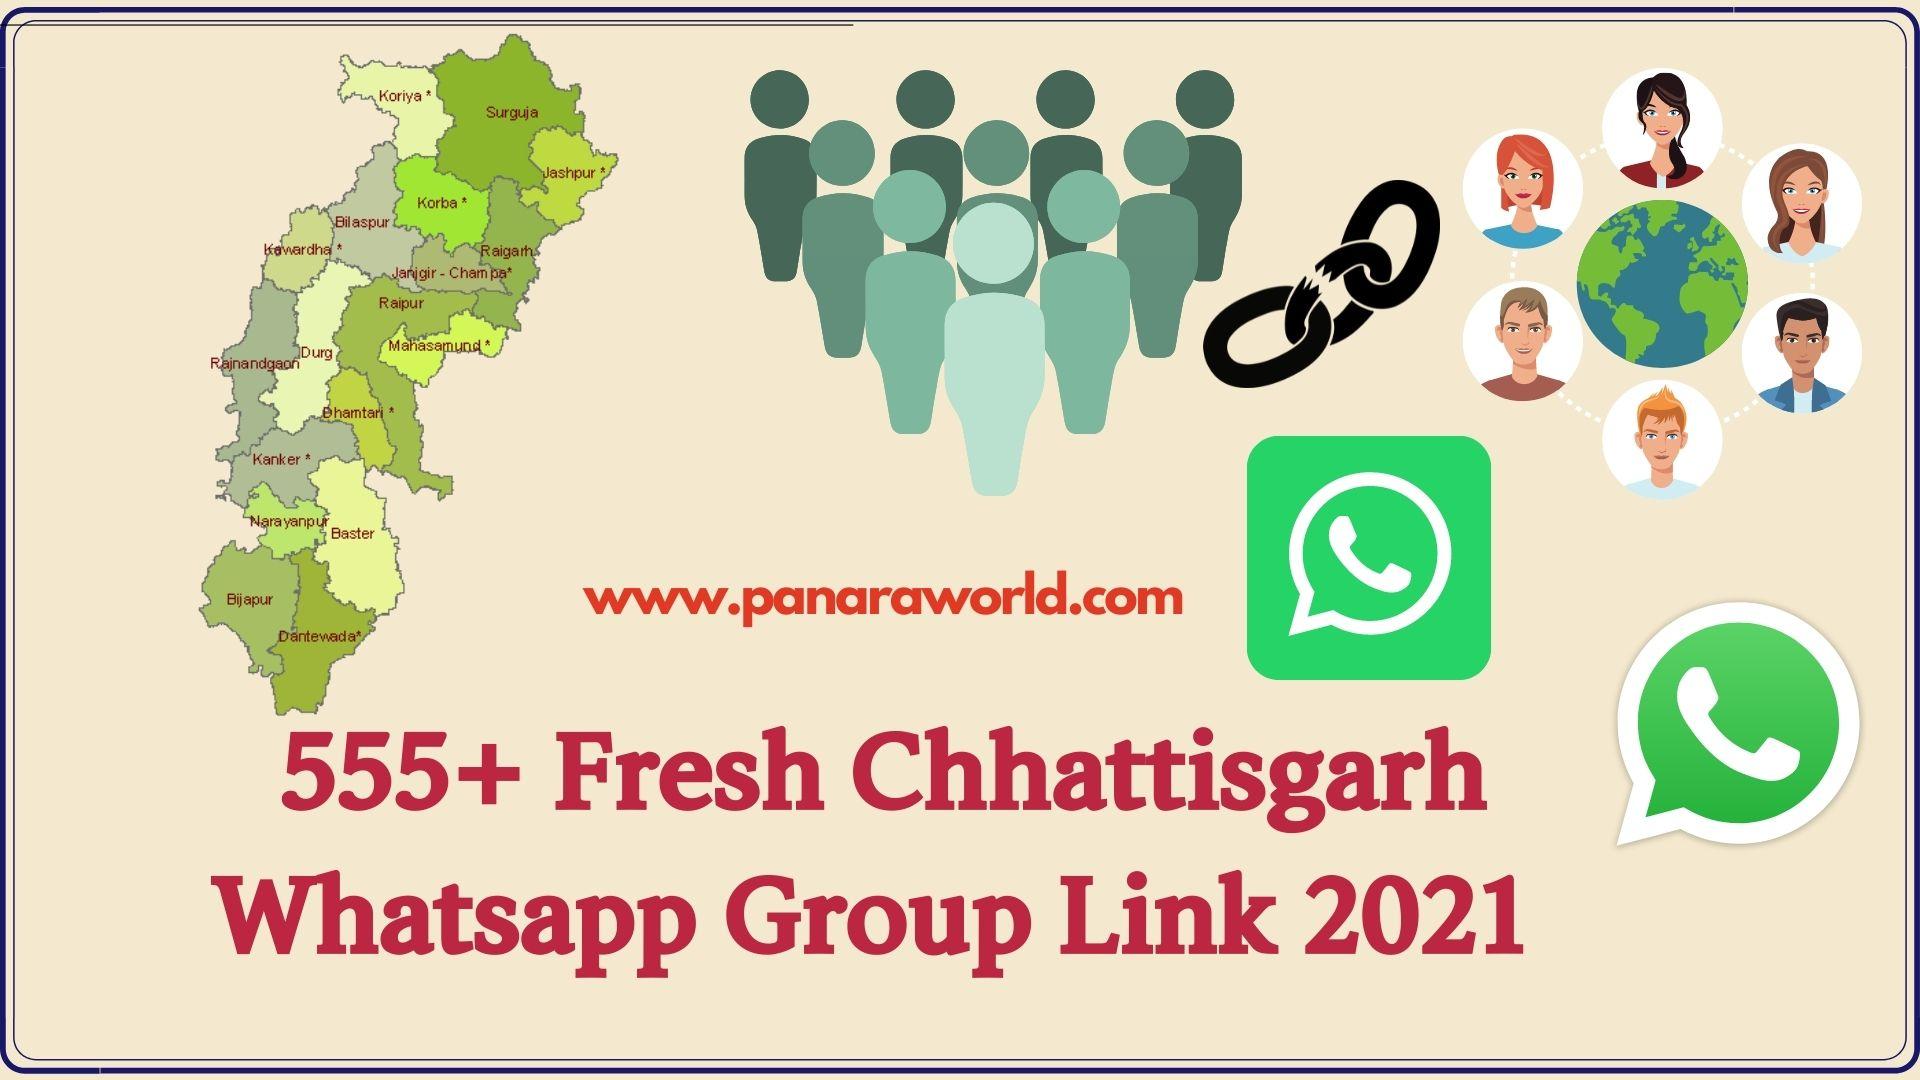 555+ Fresh Chhattisgarh Whatsapp Group Link 2021 | New Group Link